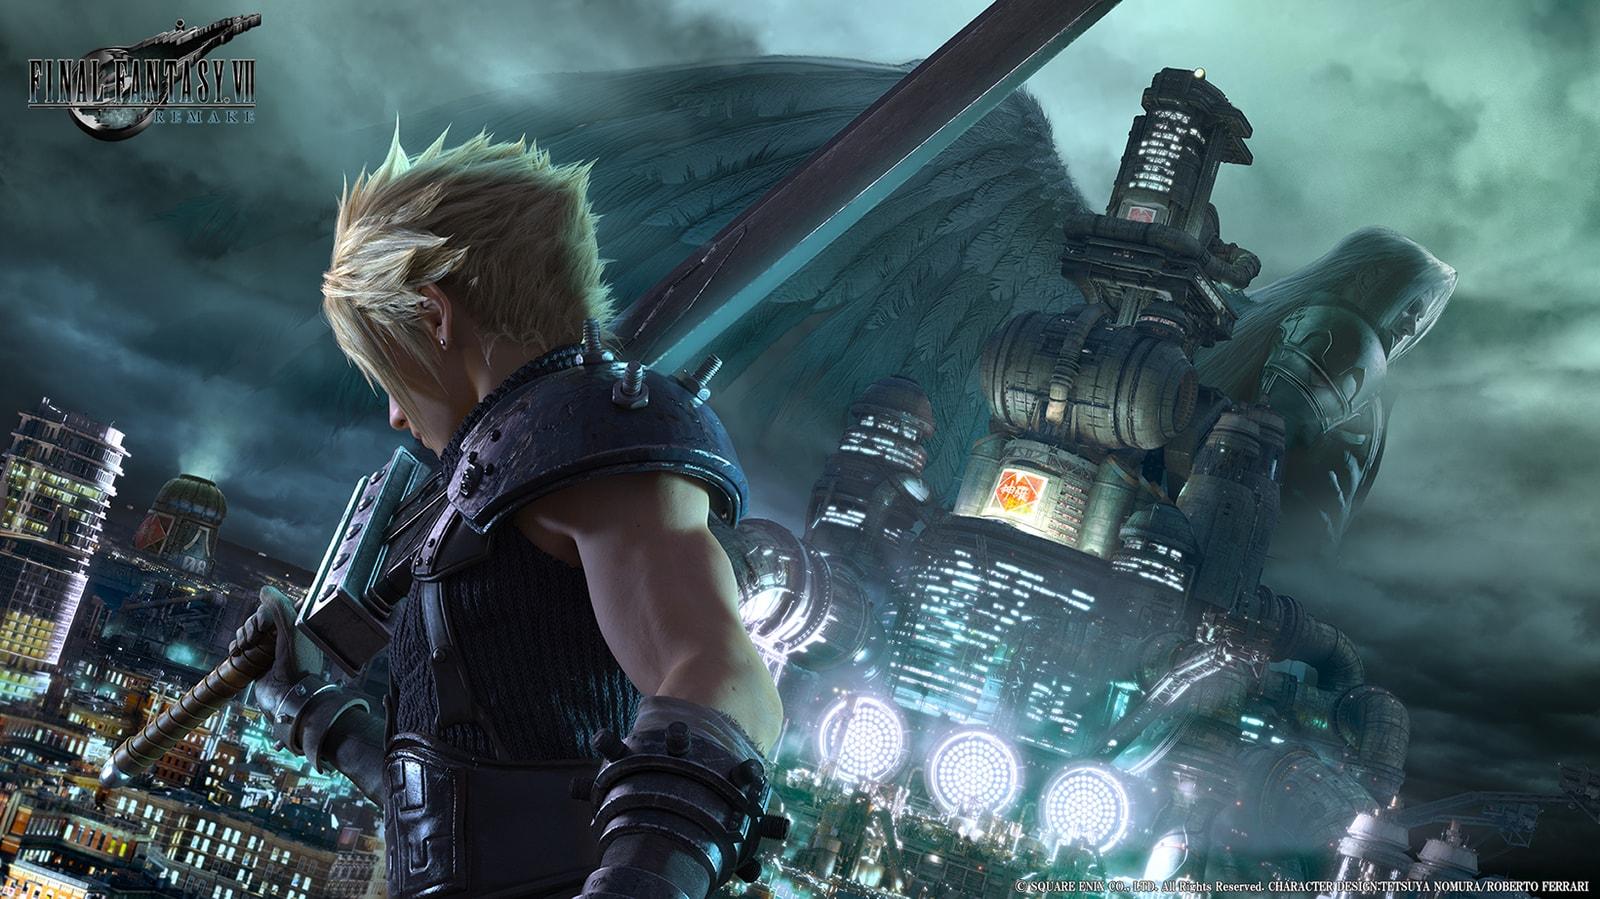 Final Fantasy VII 20th Anniversary Remake Teaser